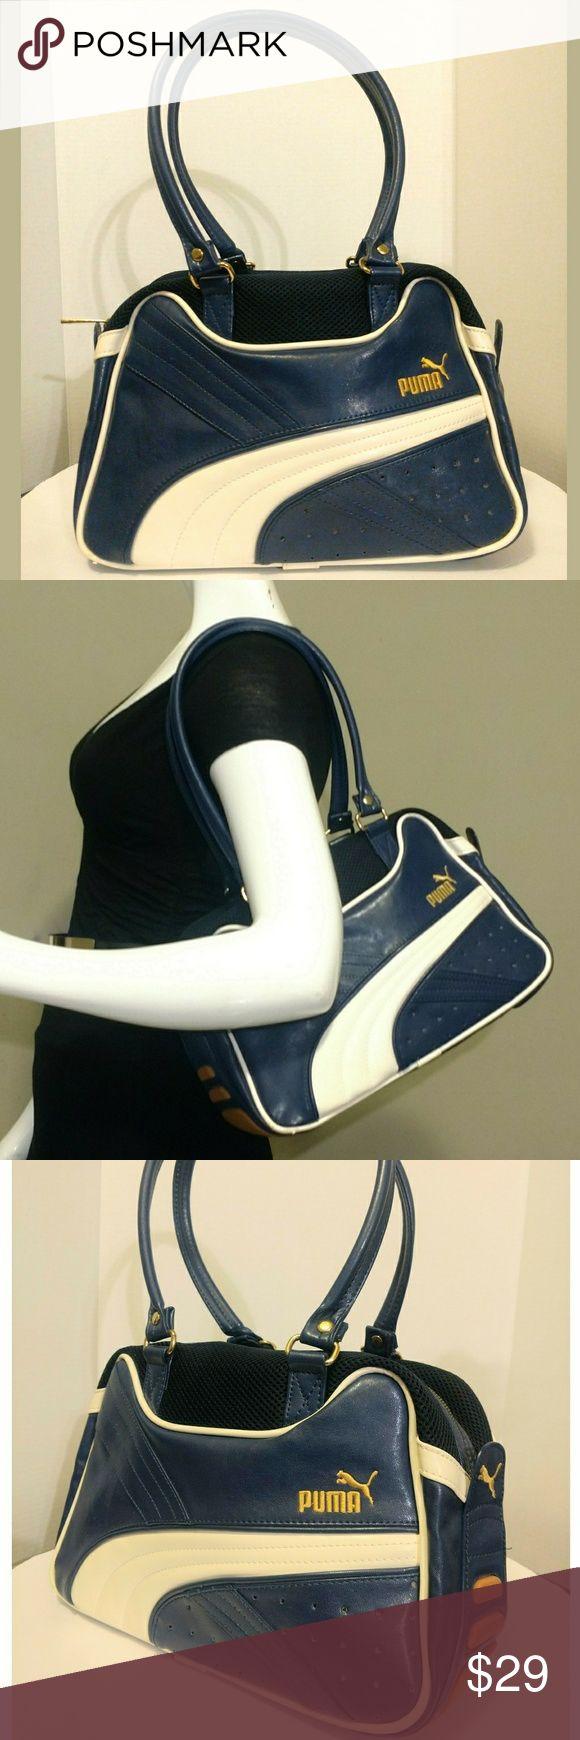 Puma Shoulder bag Cute blue and white Puma shoulder with gold tone hardware Puma Bags Shoulder Bags